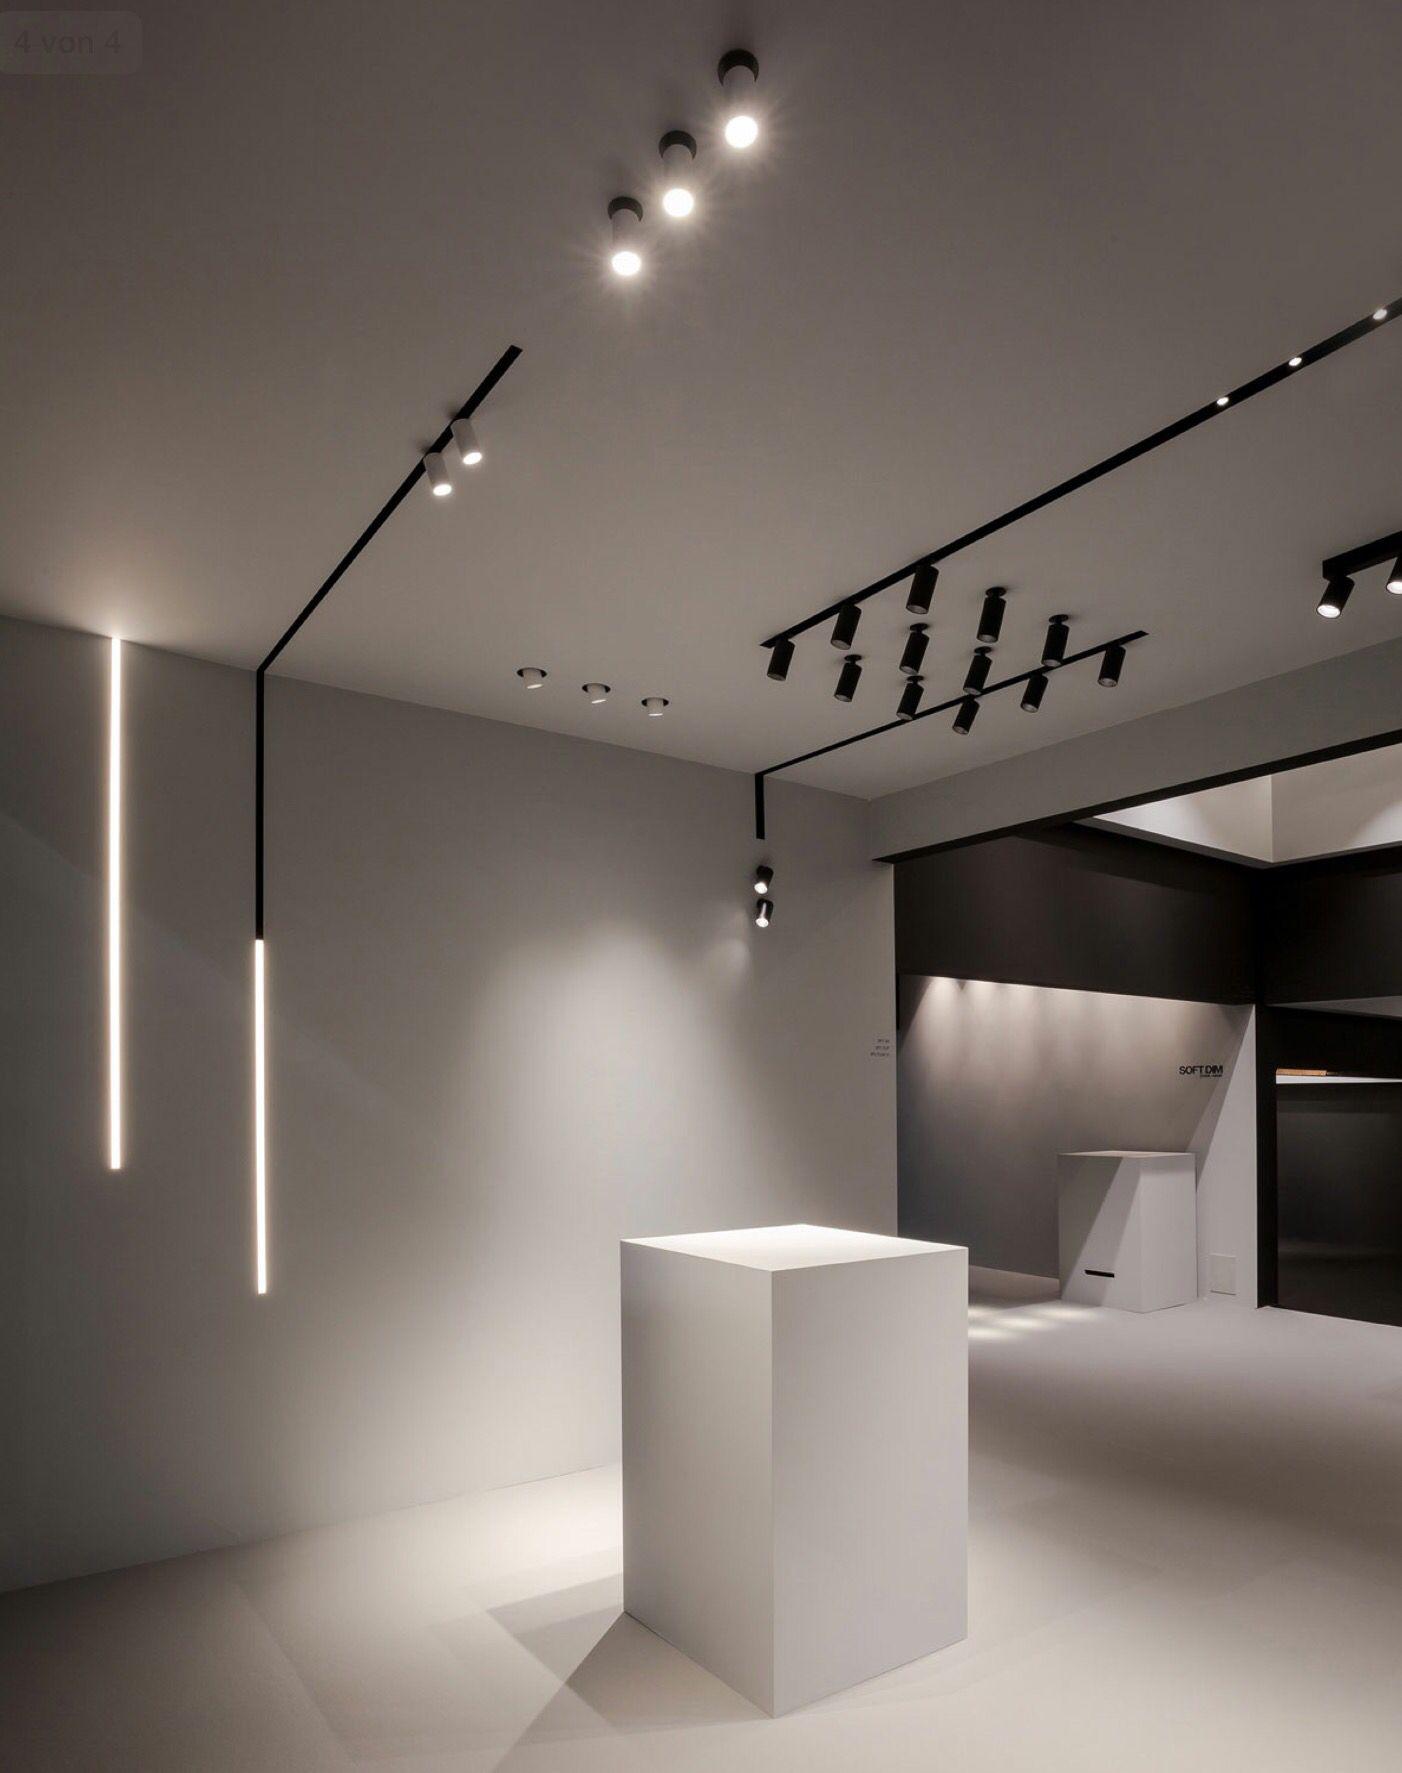 Delta light luminaires luminaires pinterest delta for Understanding lighting interior design